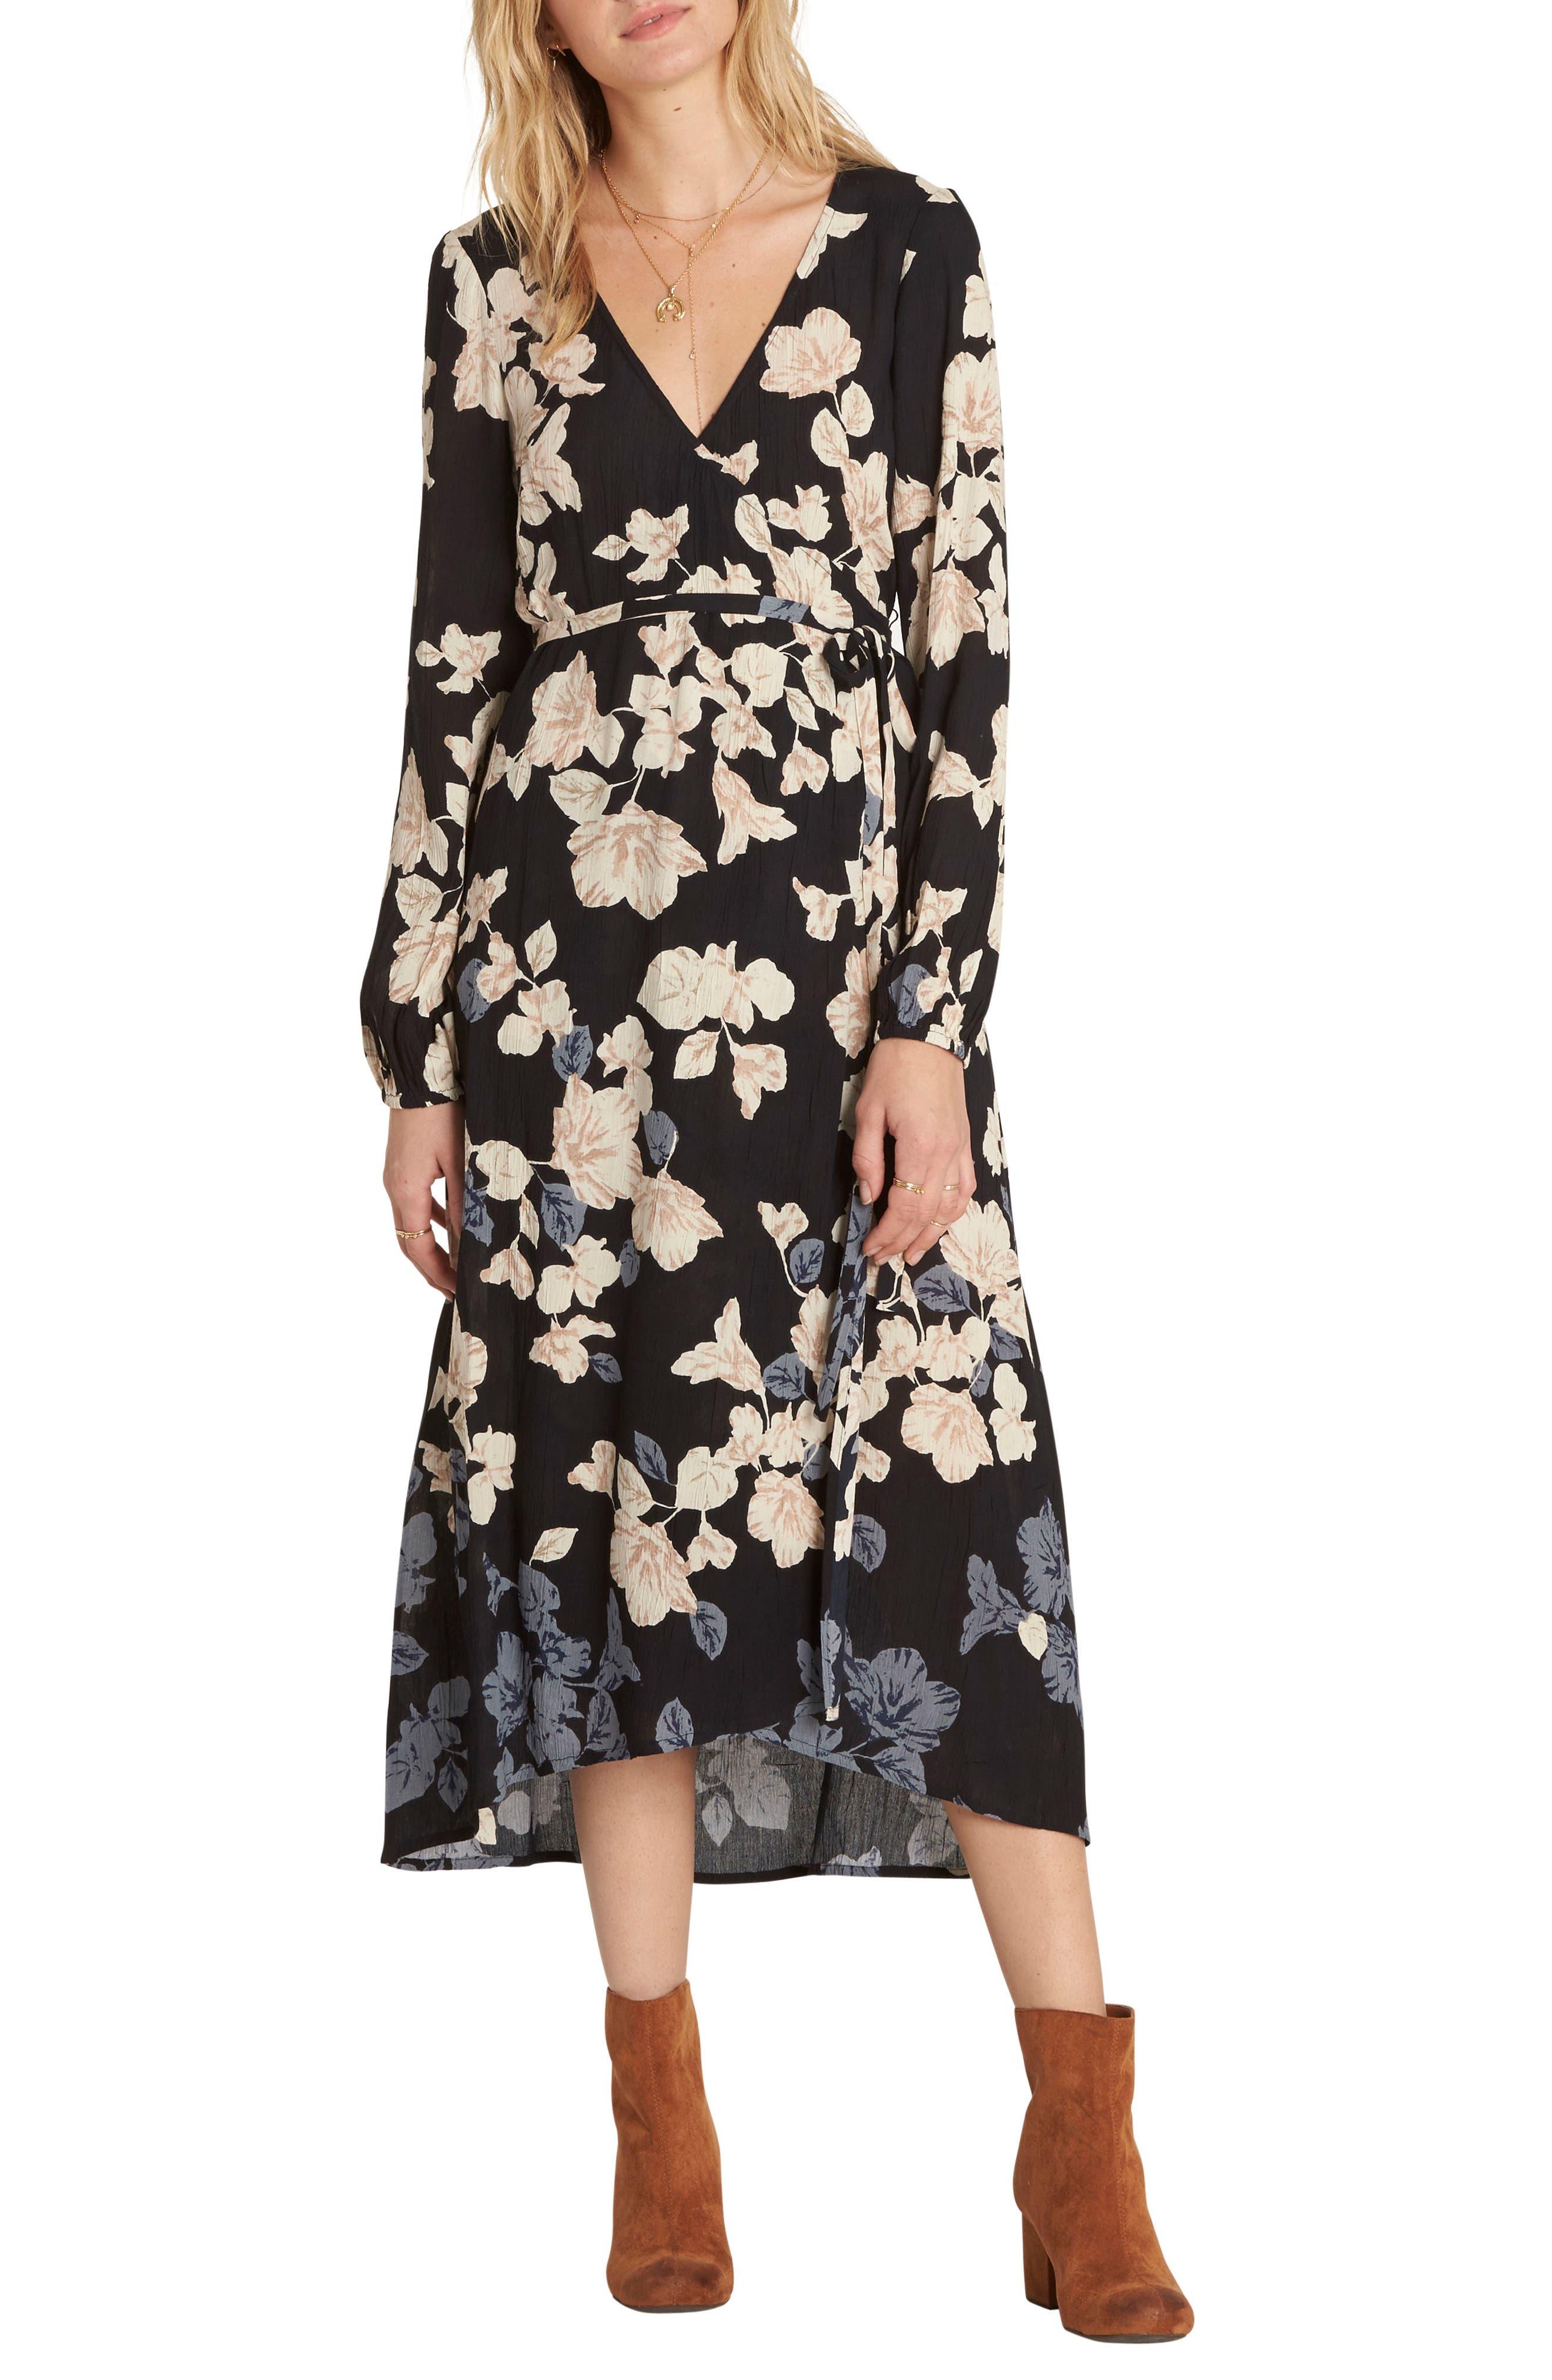 Floral Fever Midi Dress,                             Main thumbnail 1, color,                             001